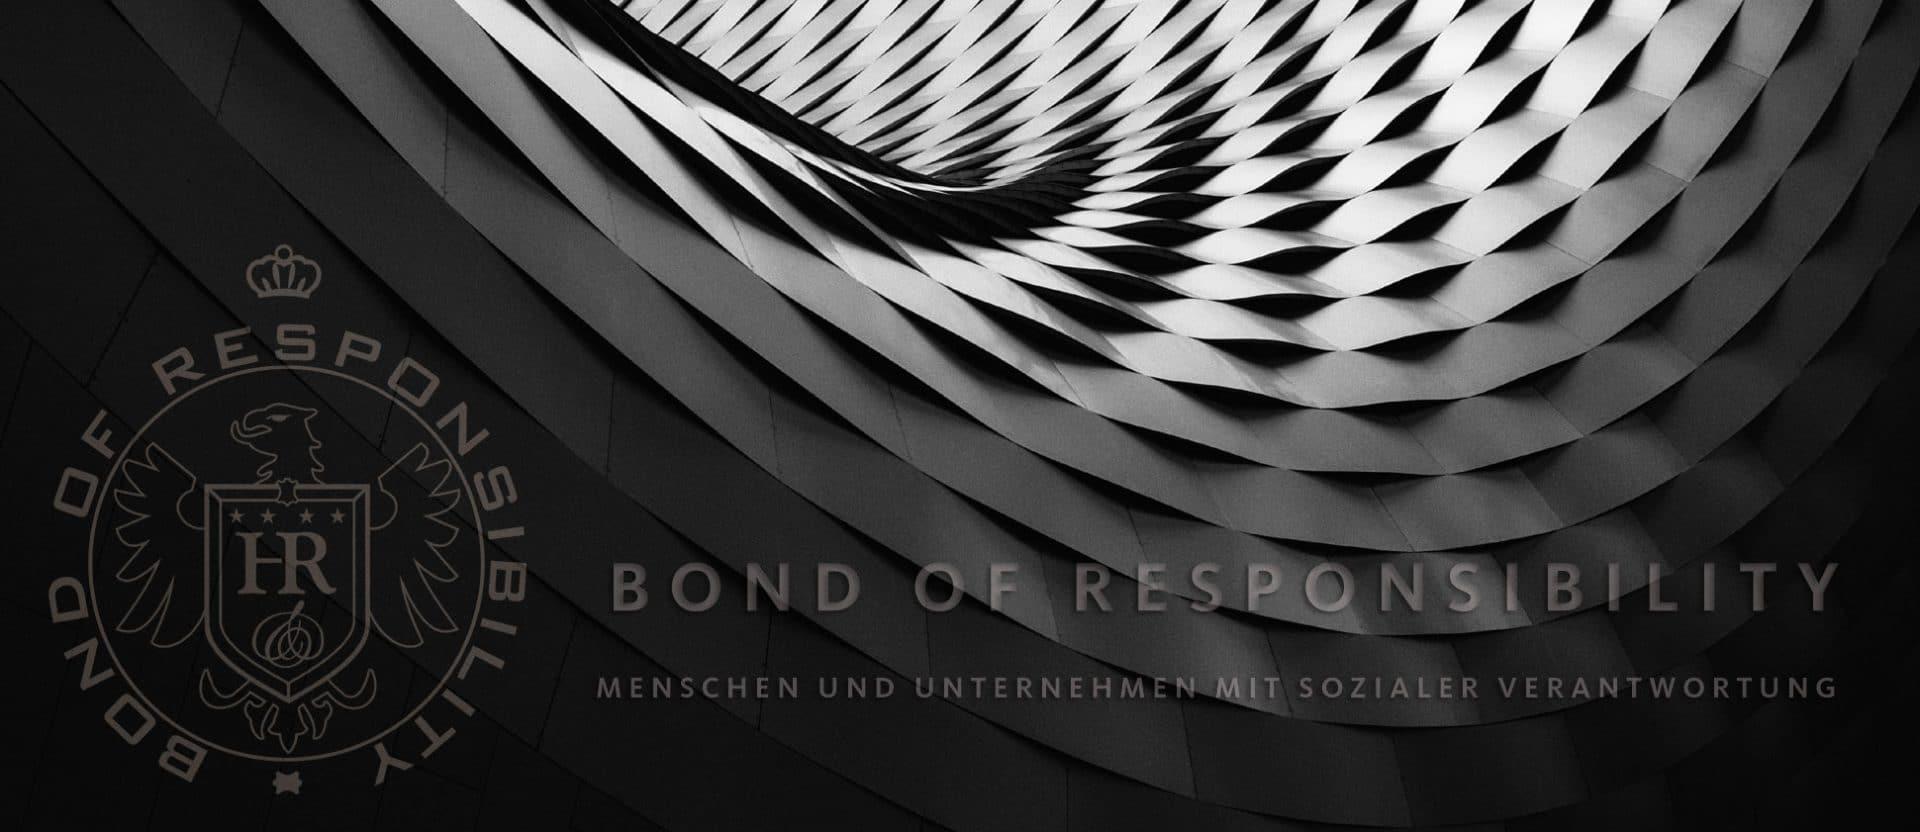 Bond of Responsibility